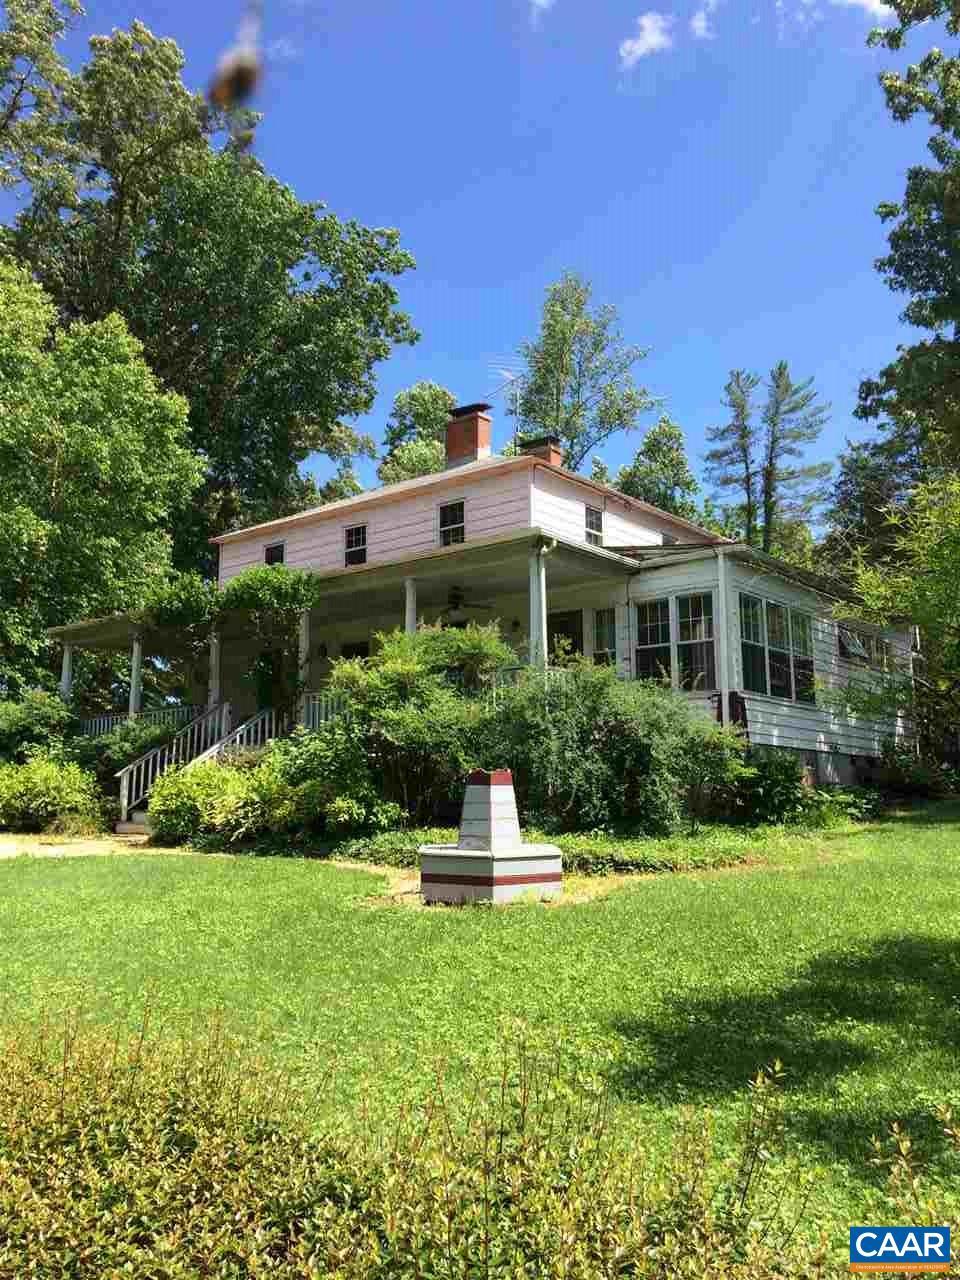 home for sale , MLS #566937, 830 Elizabeth Ln